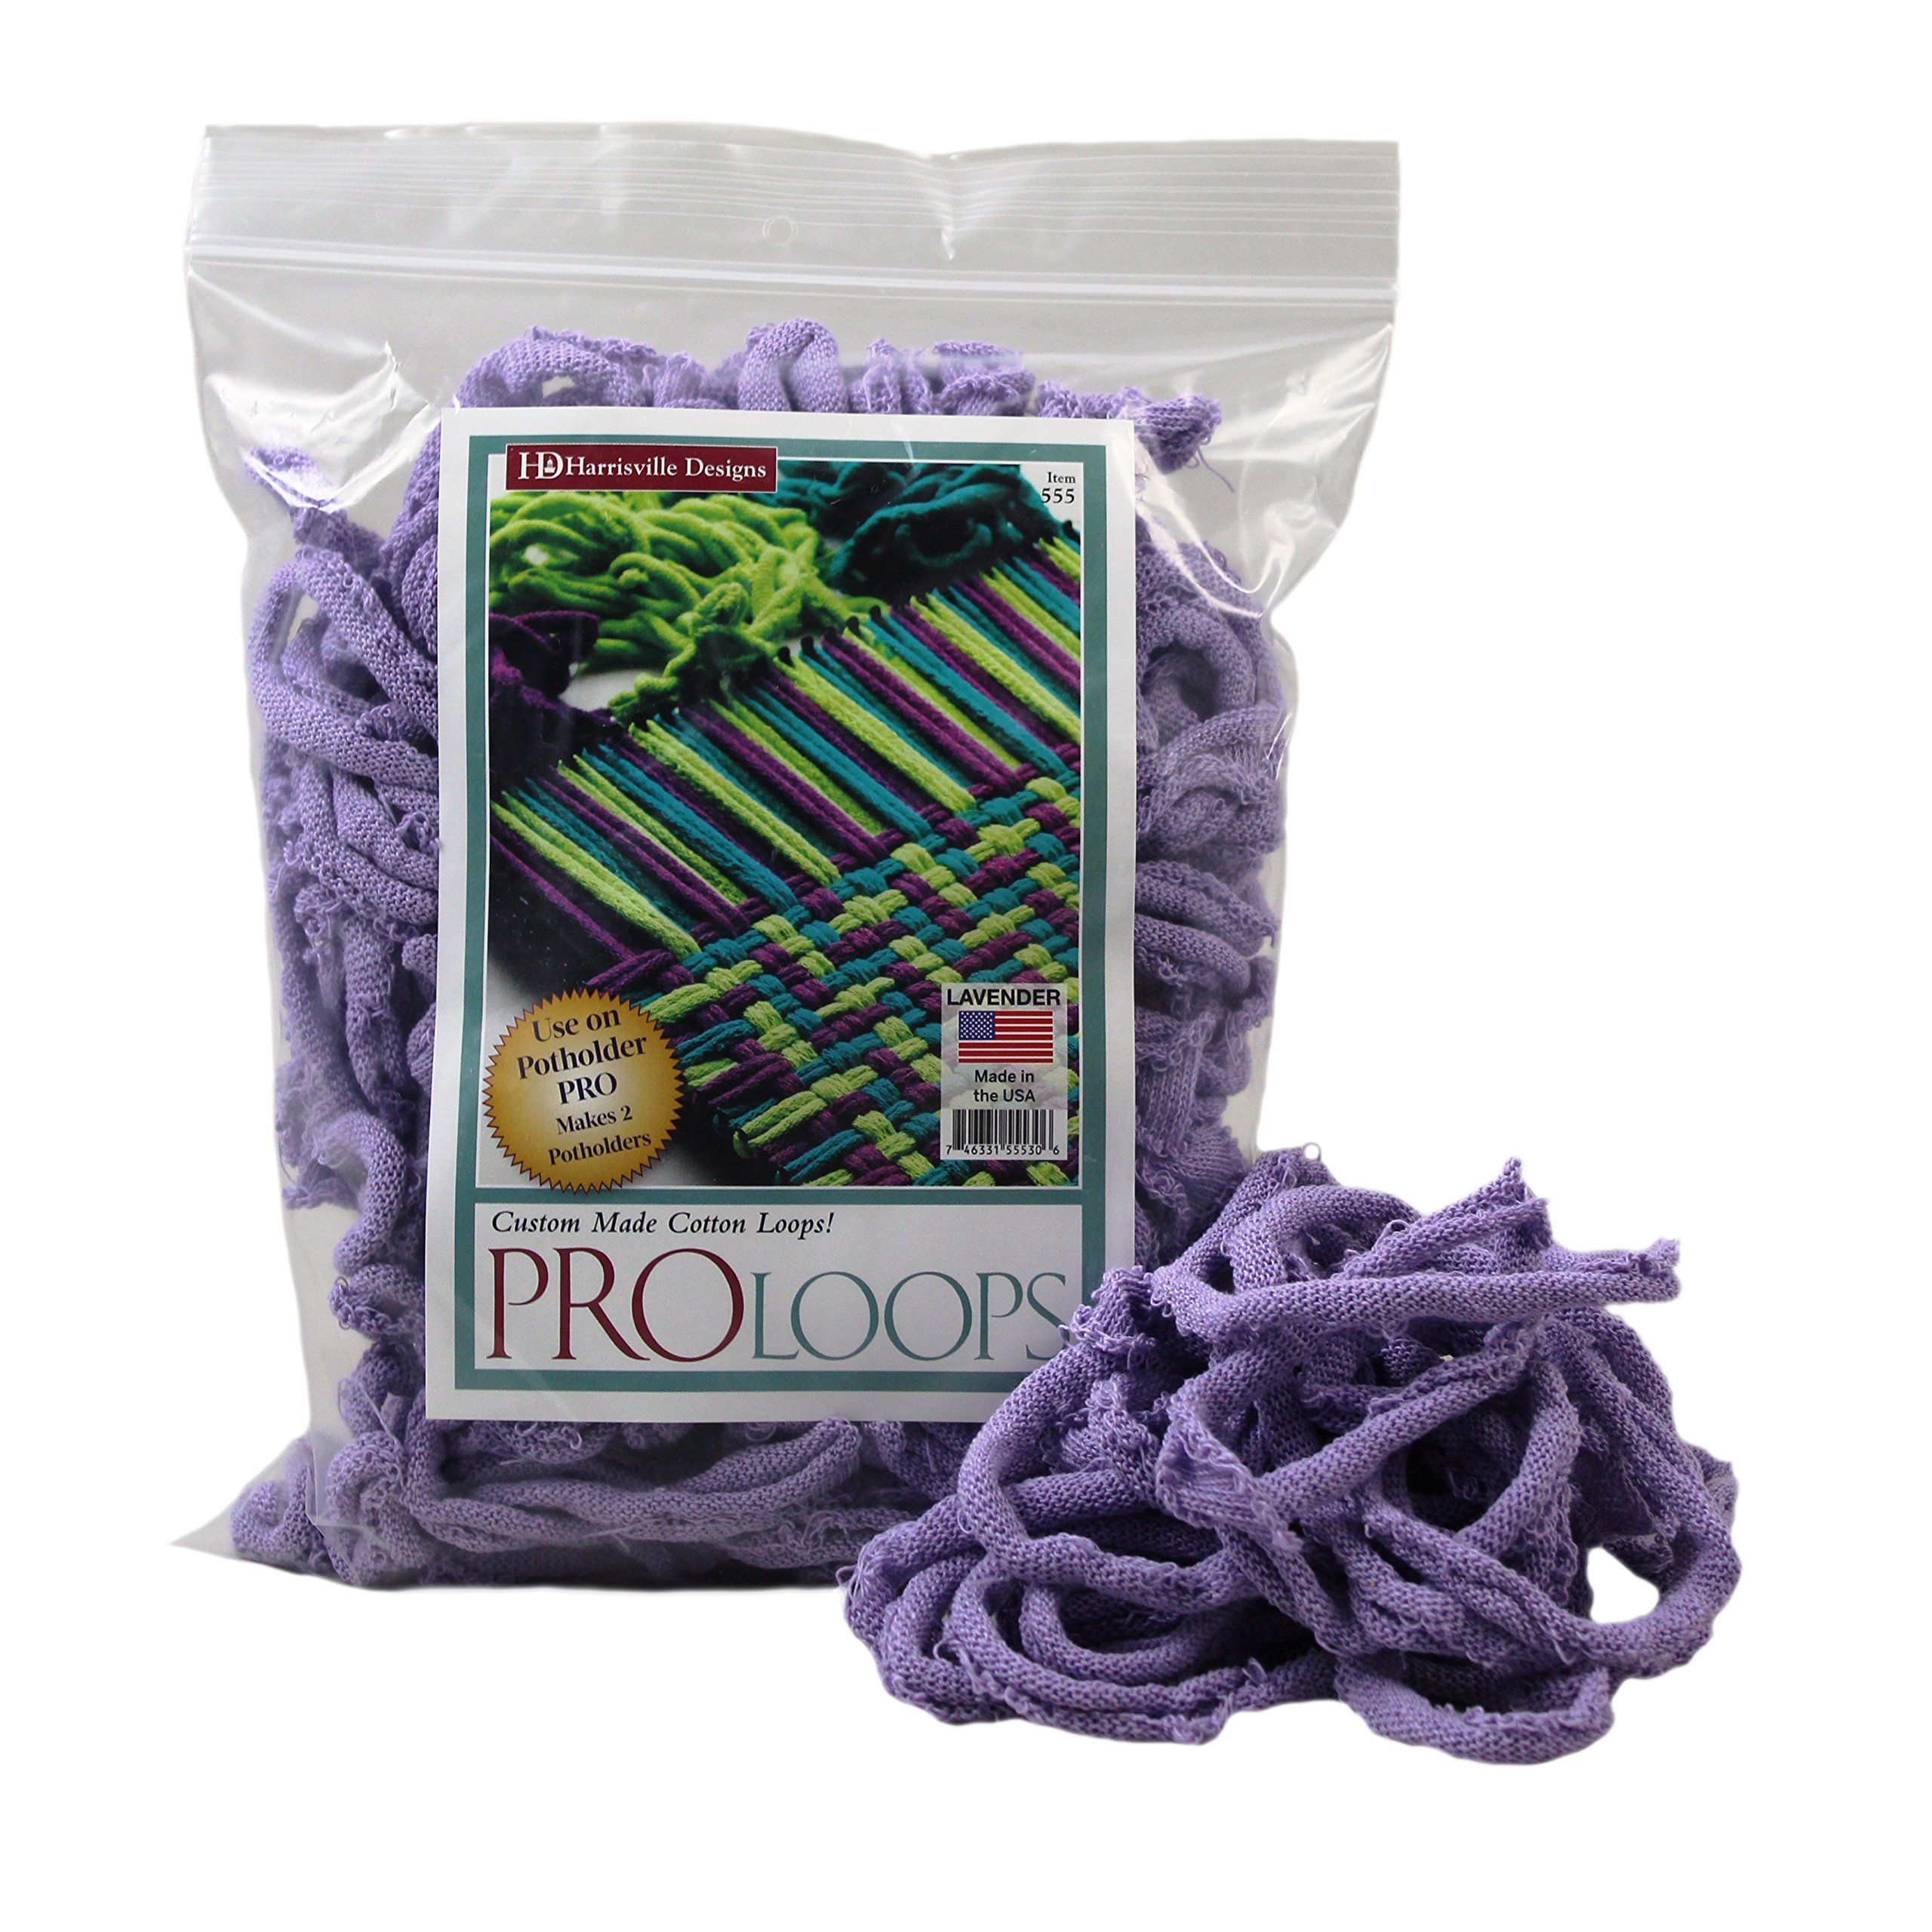 Harrisville Designs PRO 10'' Cotton Loops, Lavender - Makes 2 Potholders